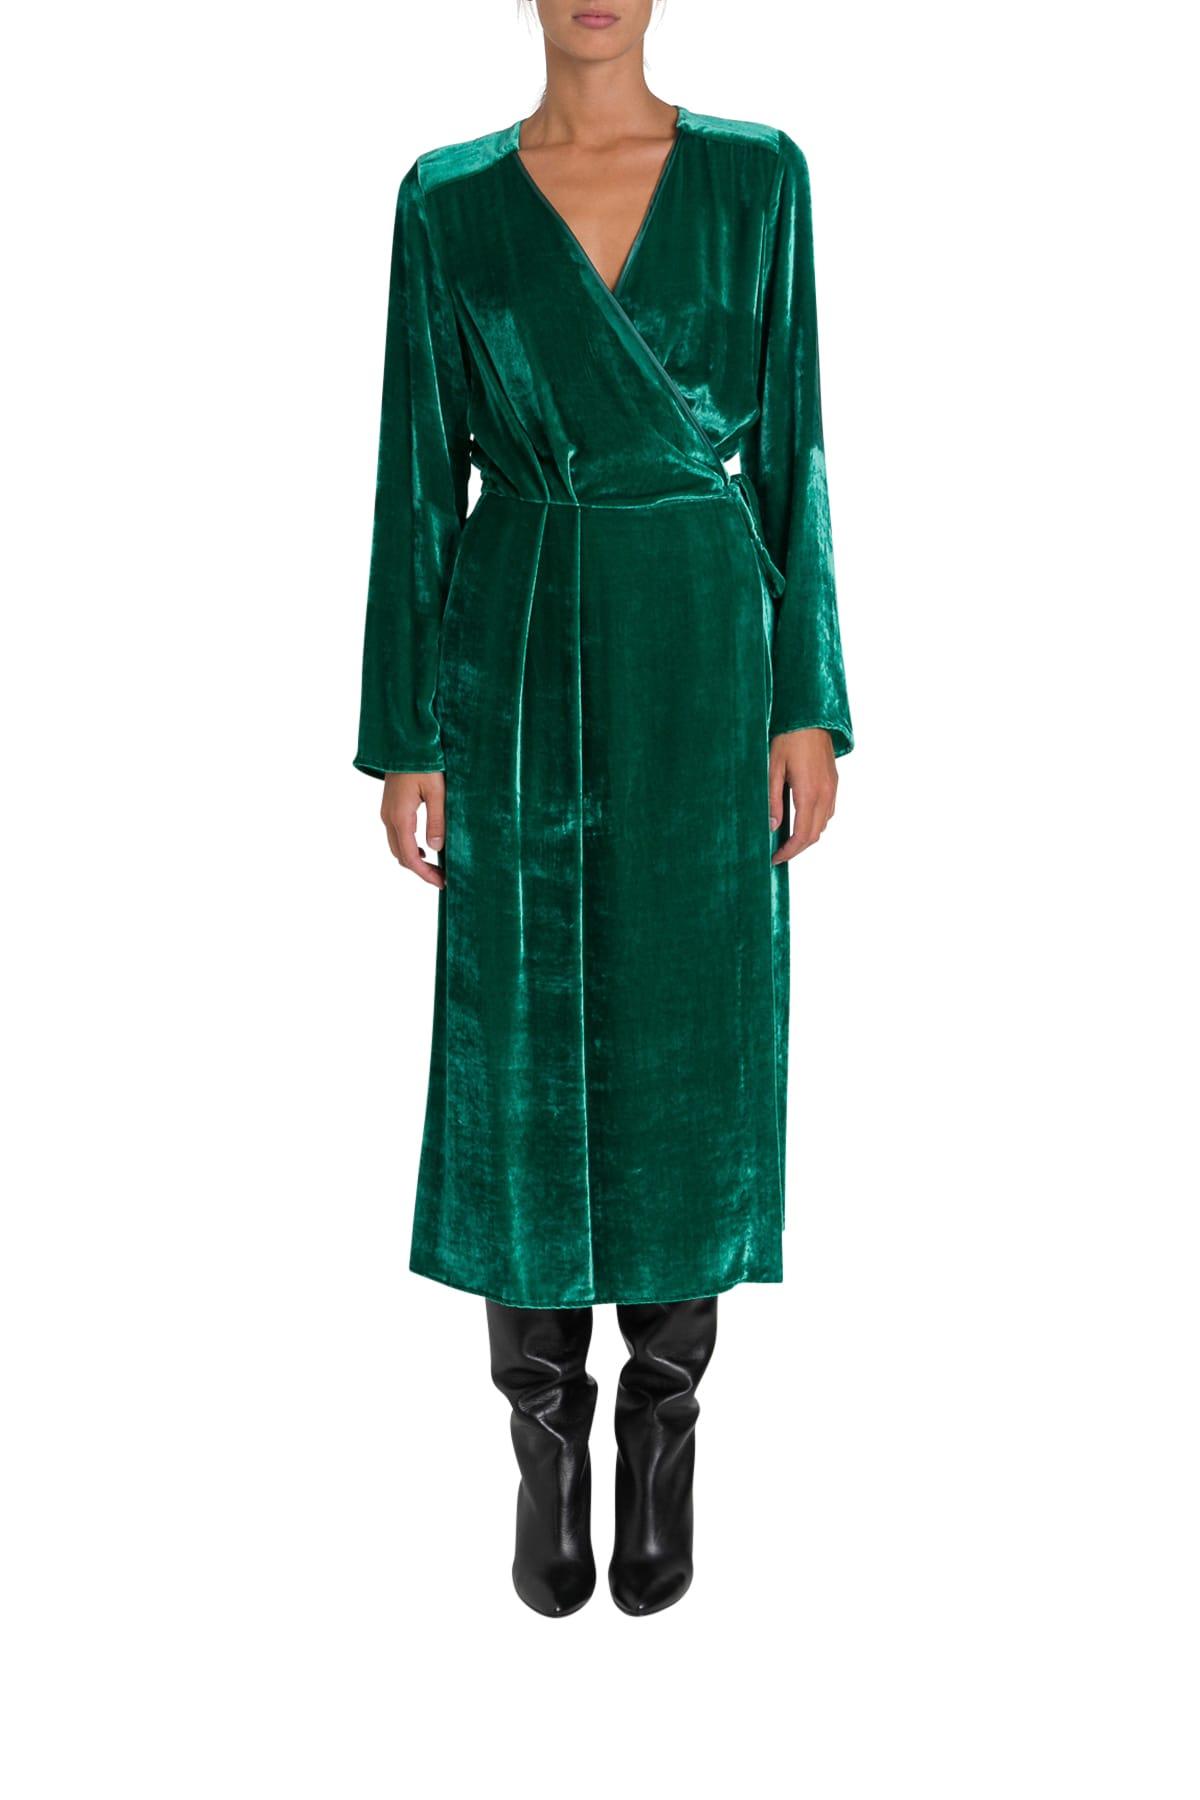 Photo of  SEMICOUTURE Griselda Wrap Dress- shop SEMICOUTURE  online sales